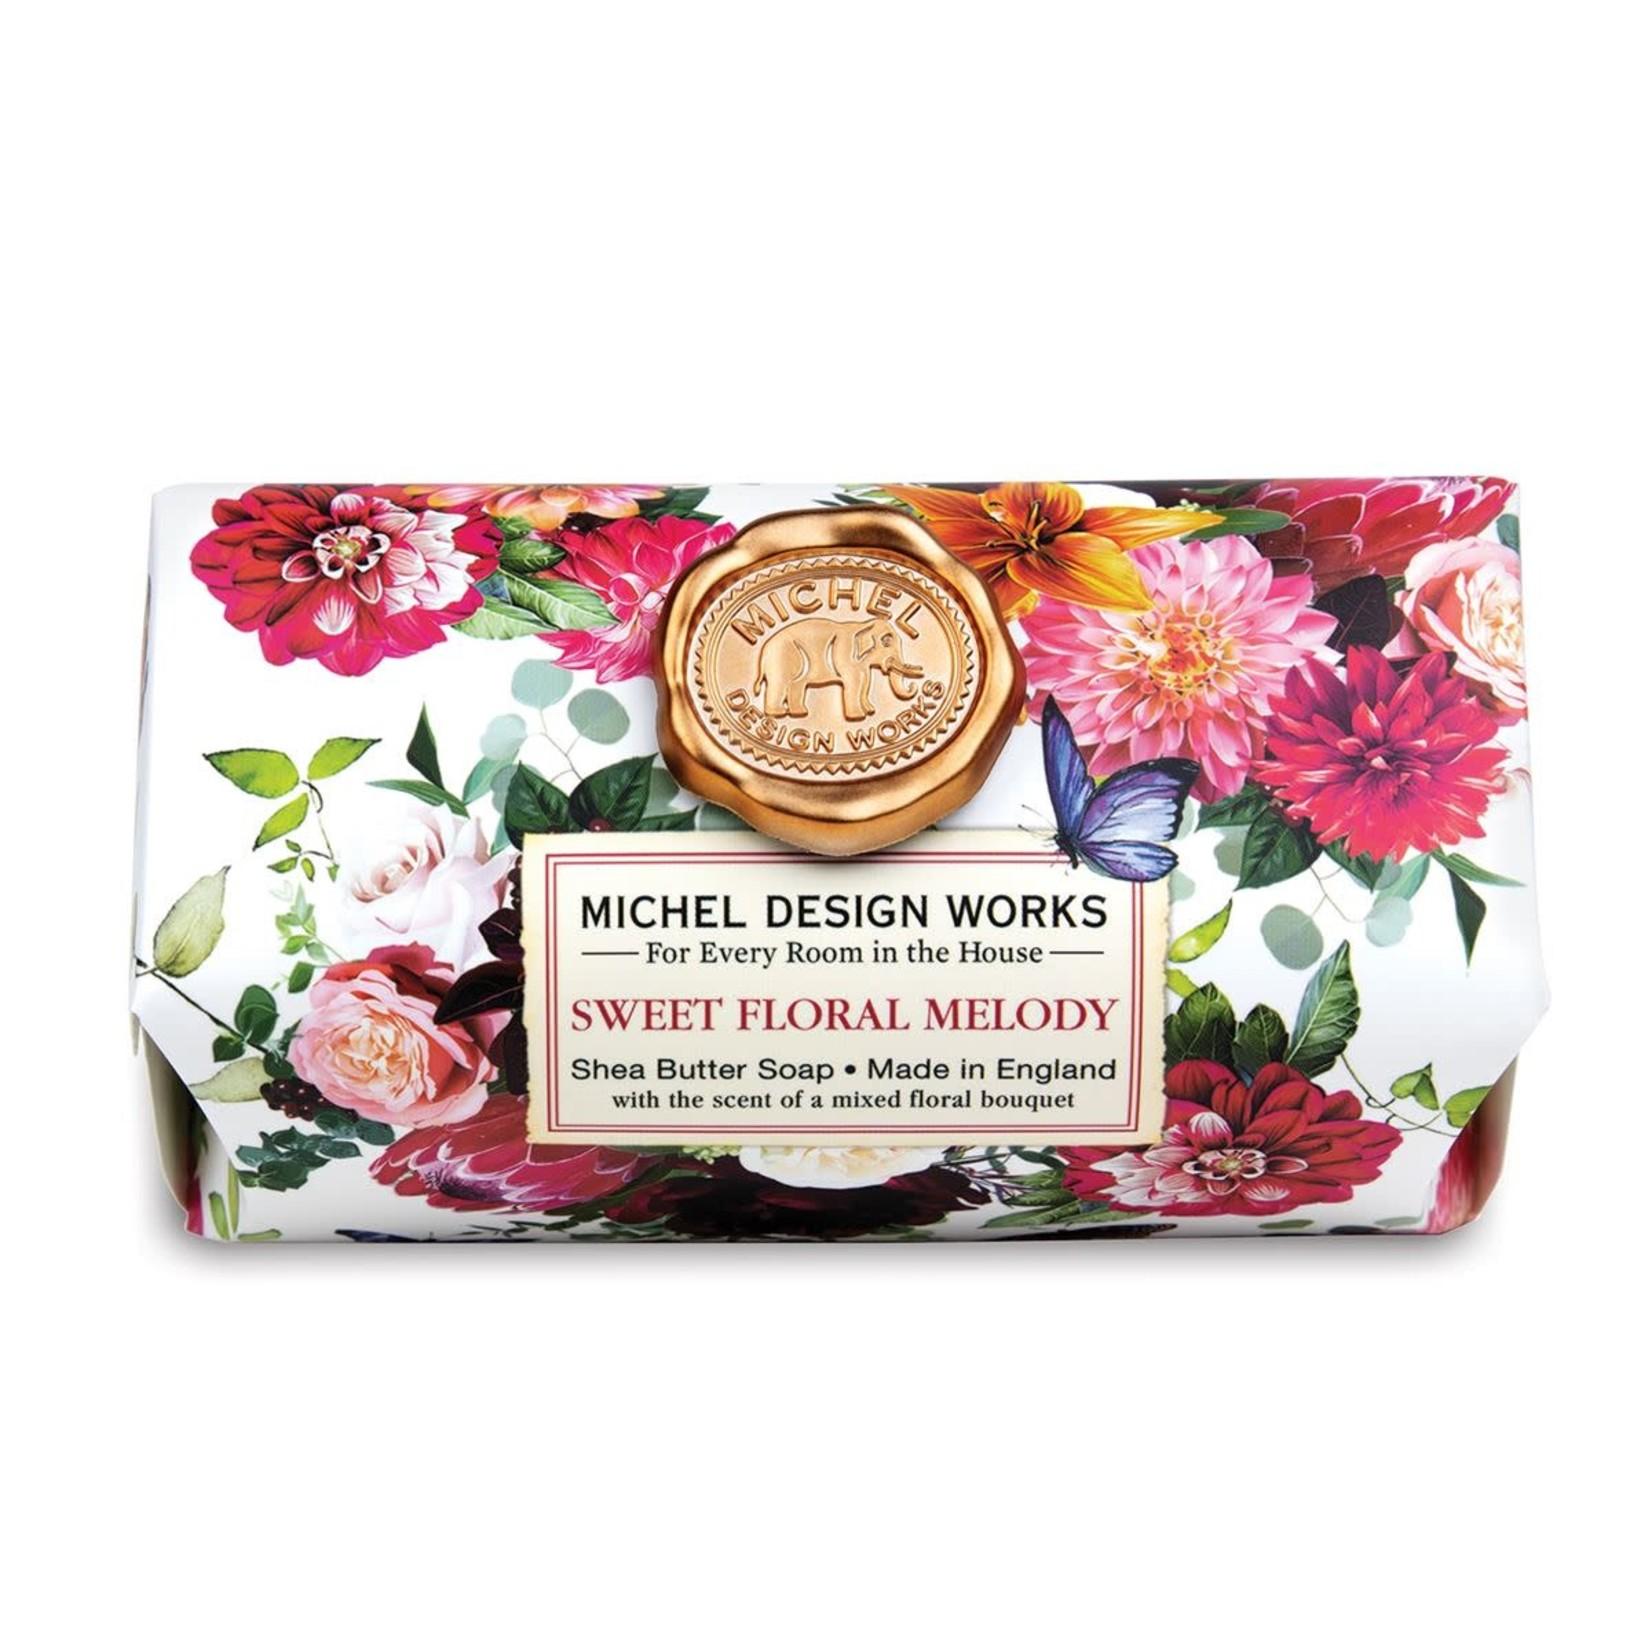 Michel Design Works Sweet Floral Melody Large Bath Soap Bar